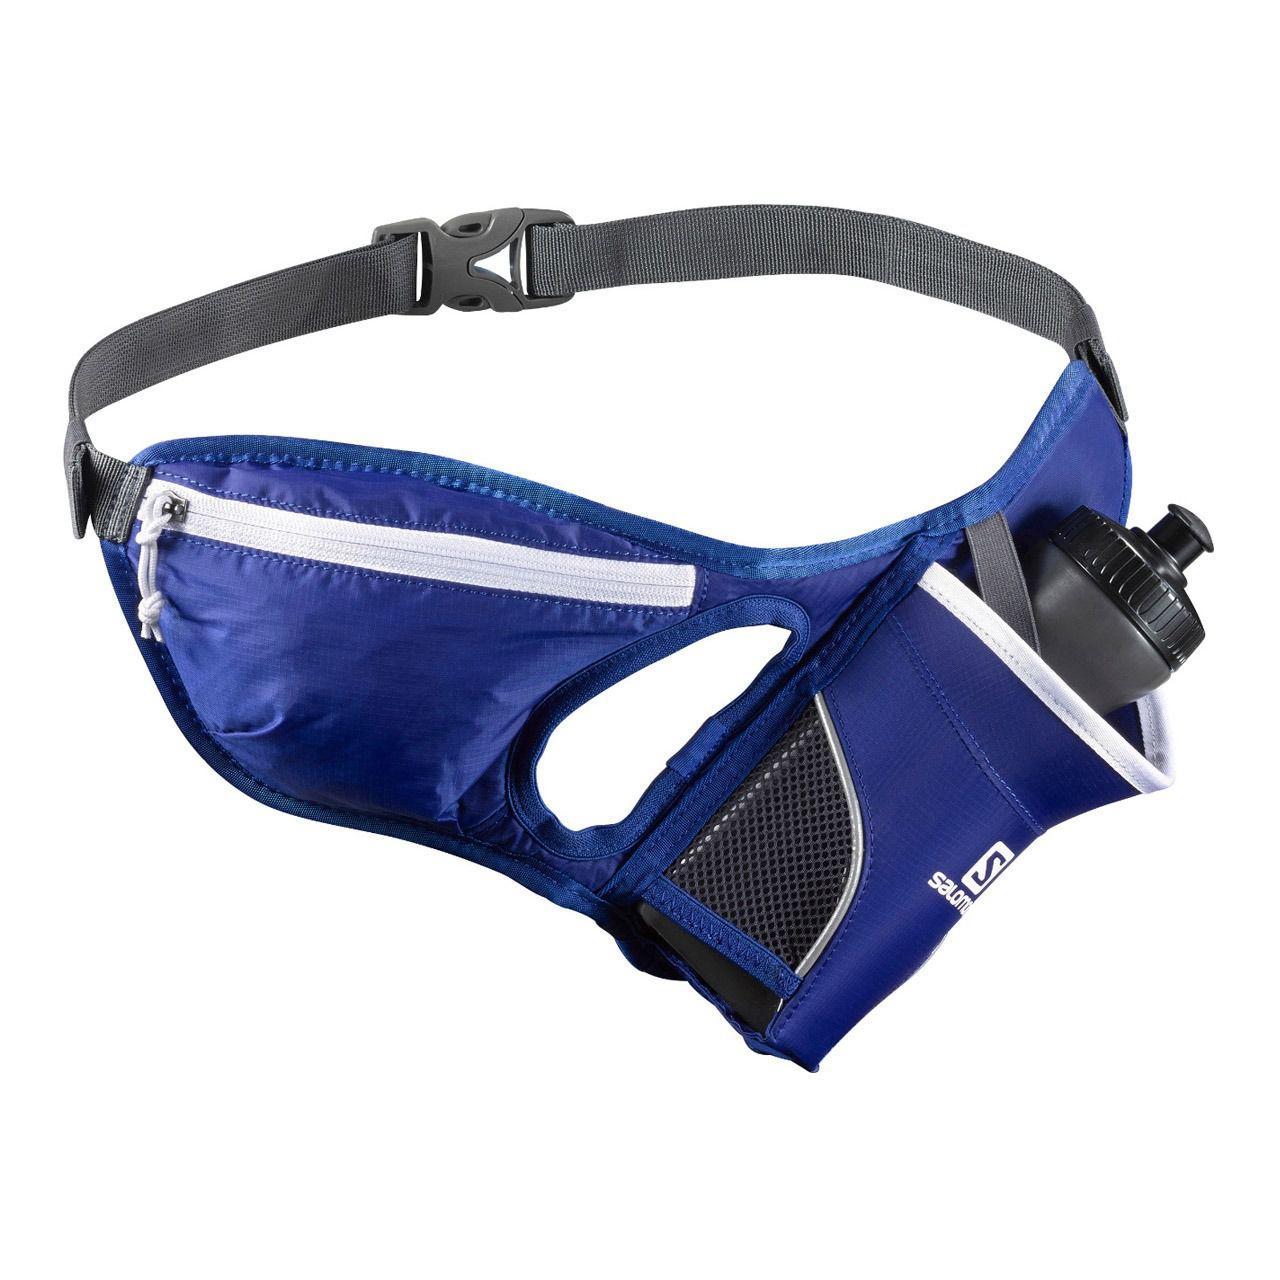 Cinto de Hidratação Salomon Hydro 45 Belt - Azul